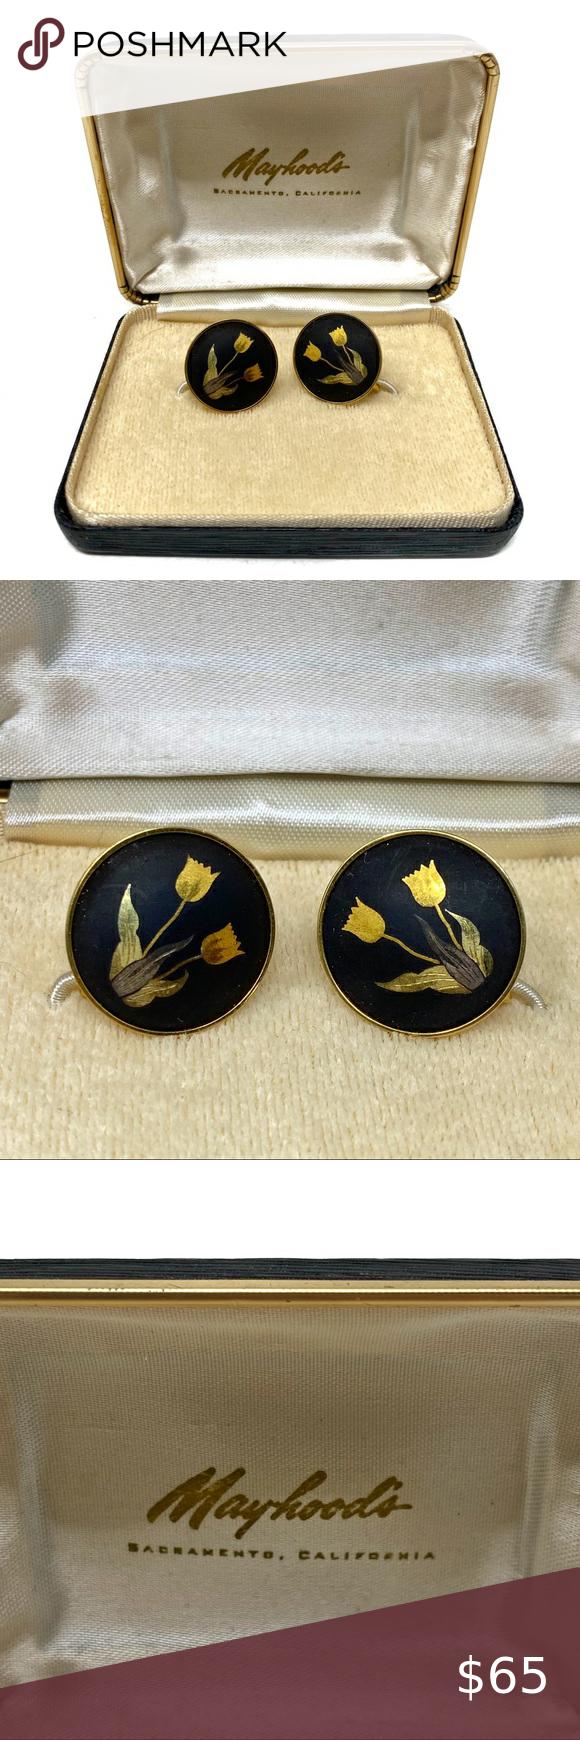 Vintage 1950s Amita Japan Damascene Screwback Earrings